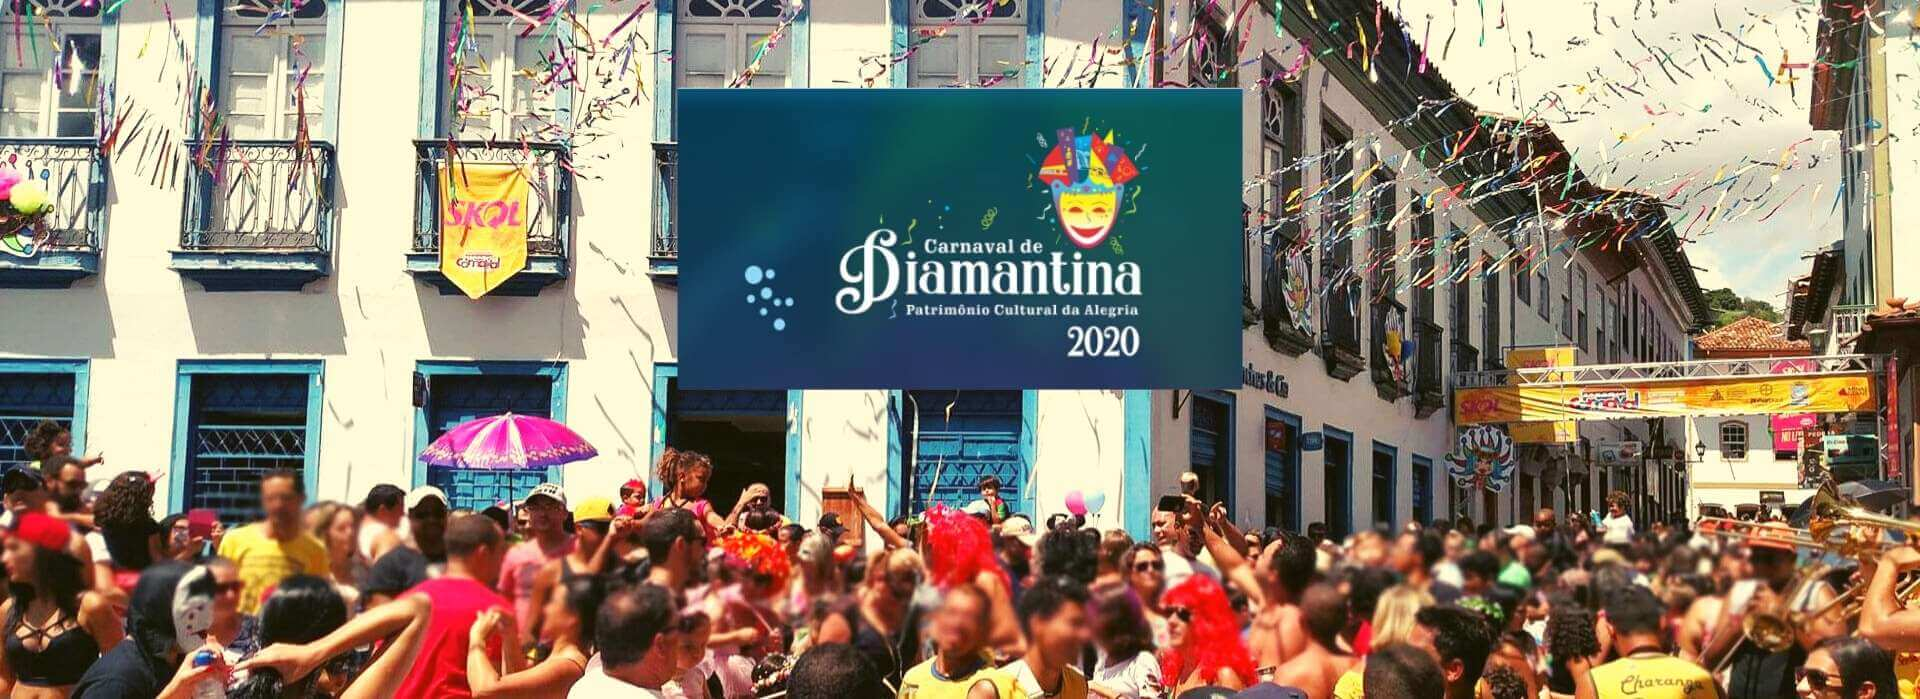 carnaval-2020-home